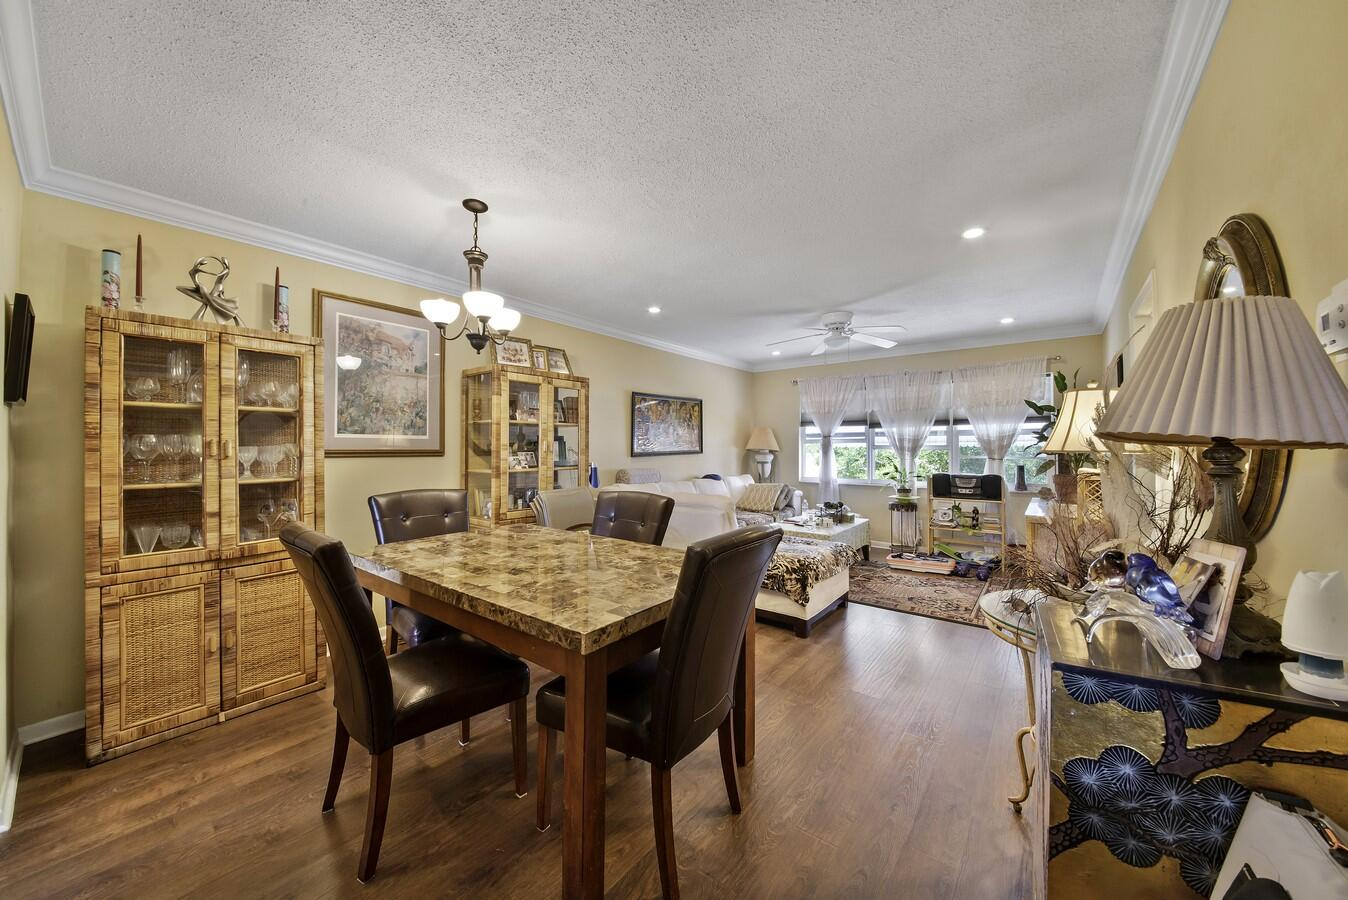 Home for sale in Leisureville Pompano Beach Florida